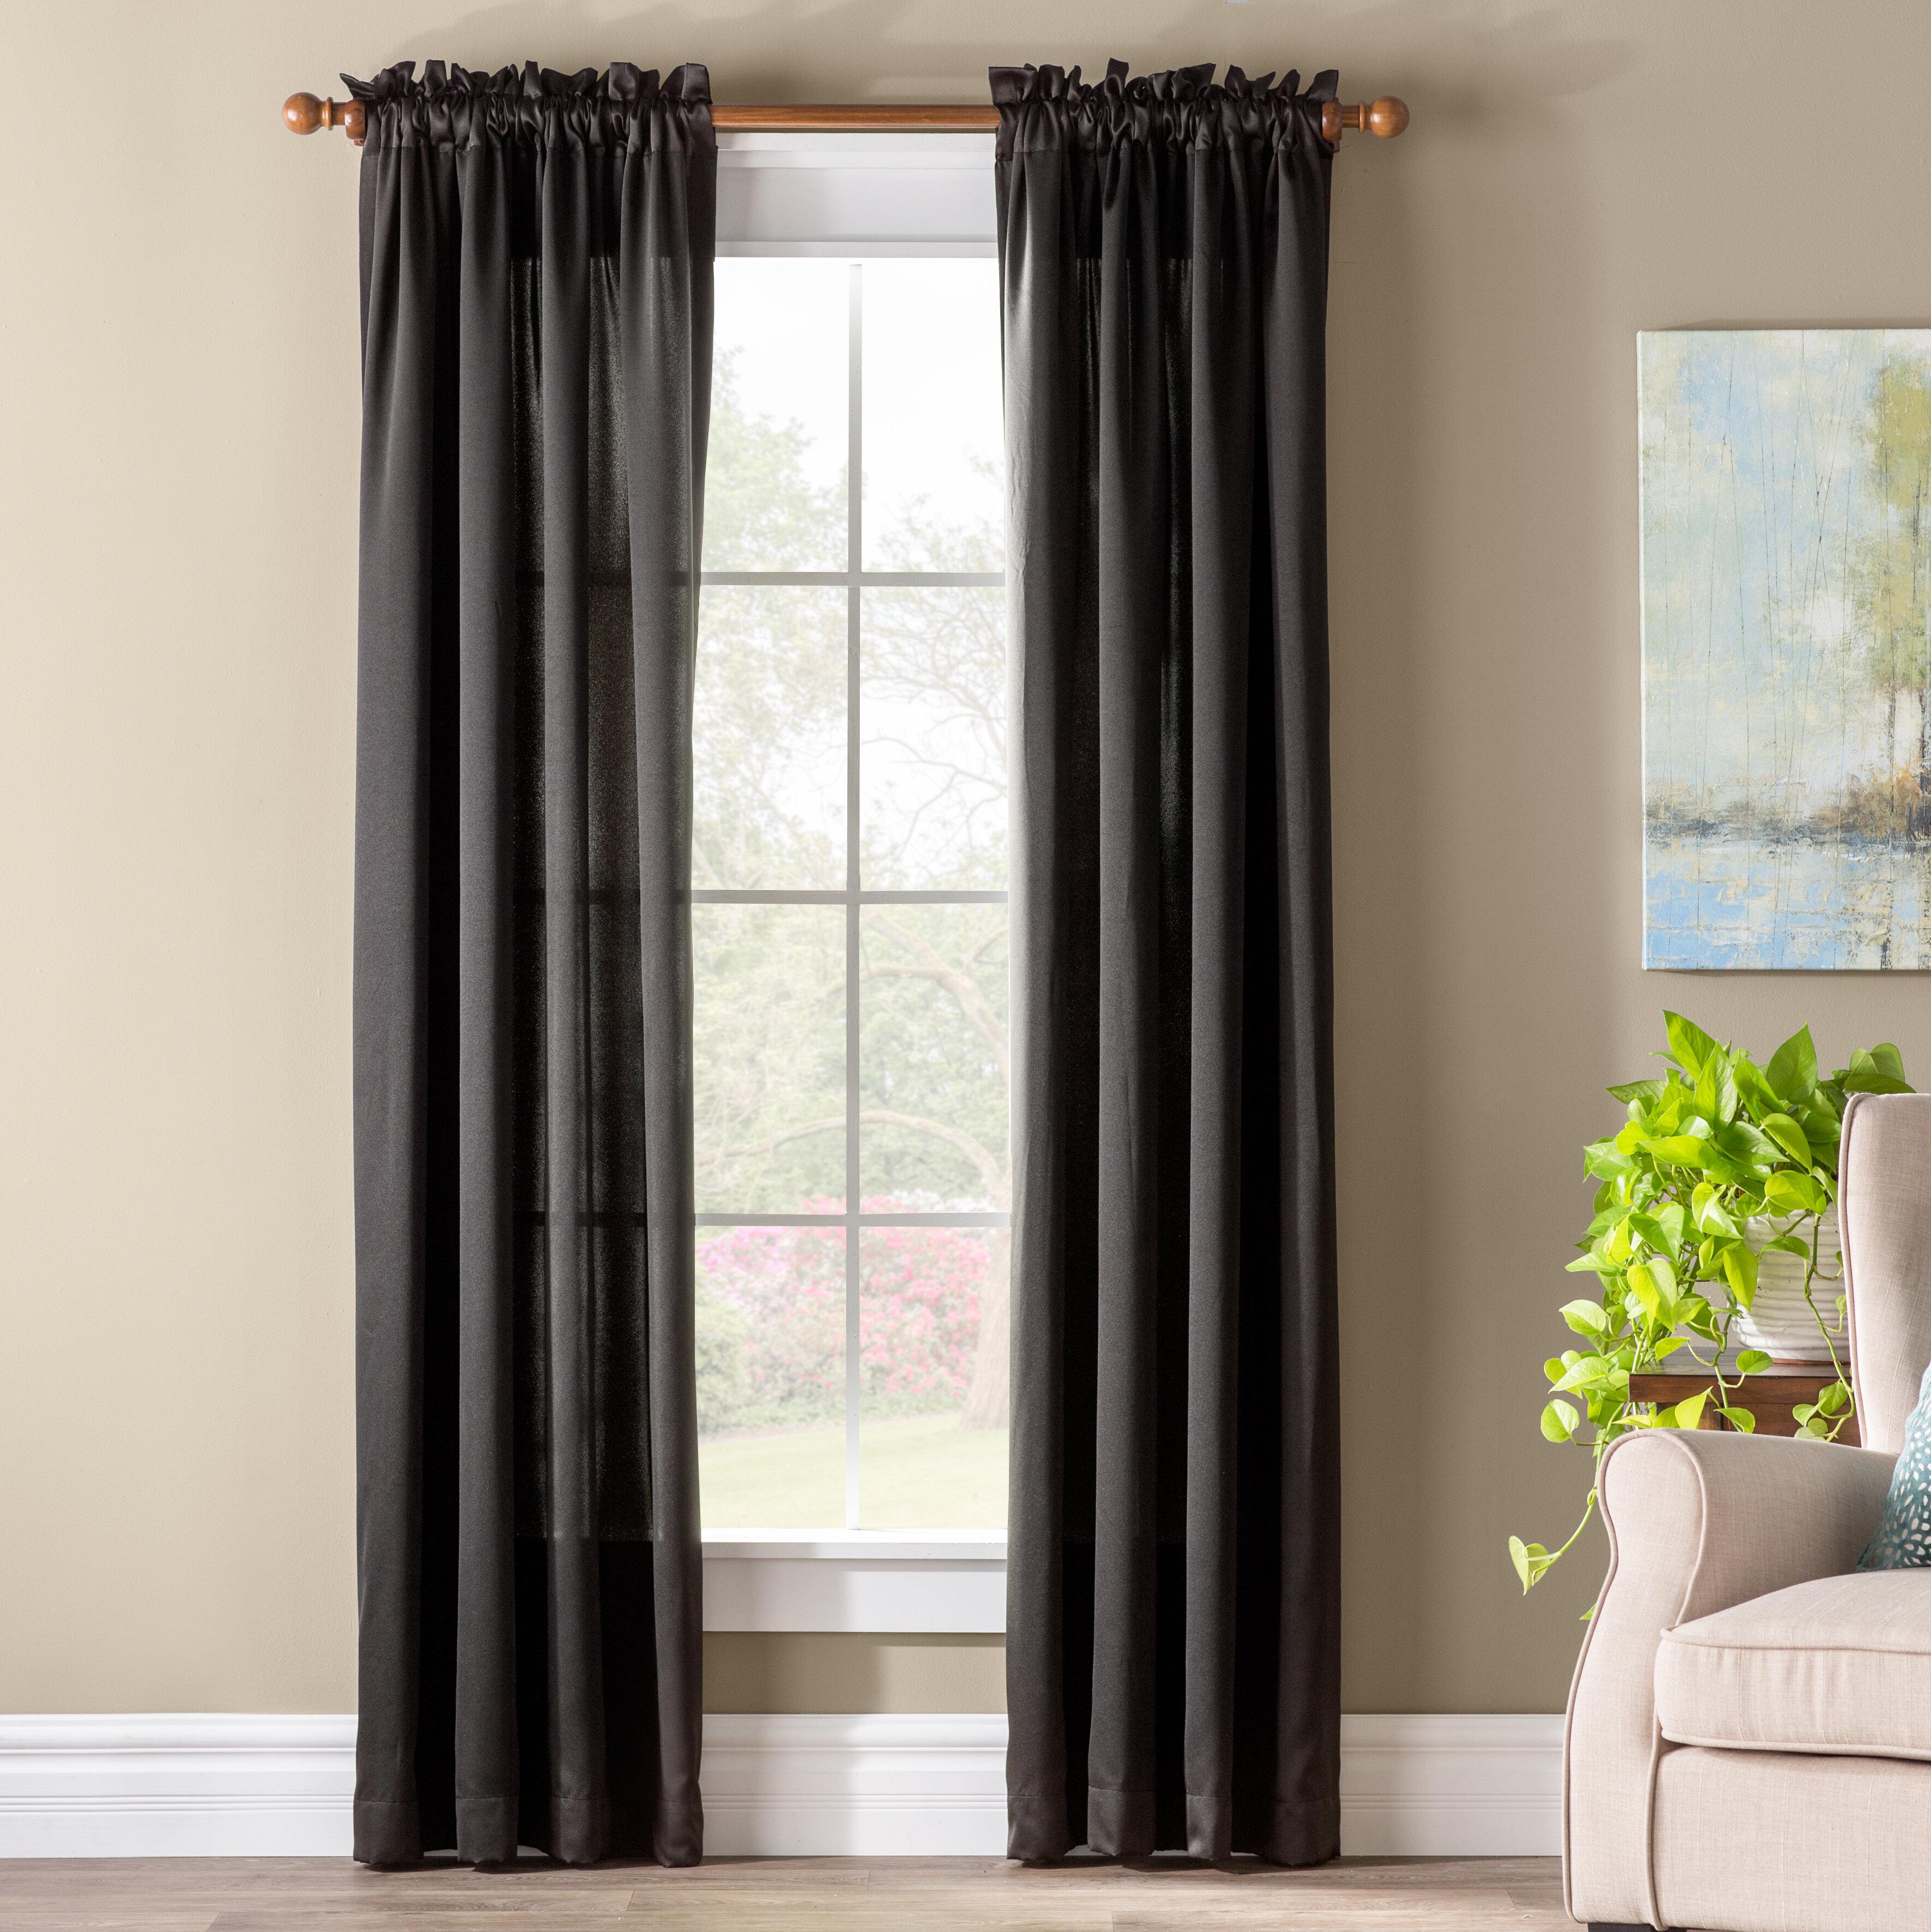 Bohemian Curtains Drapes You Ll Love In 2021 Wayfair